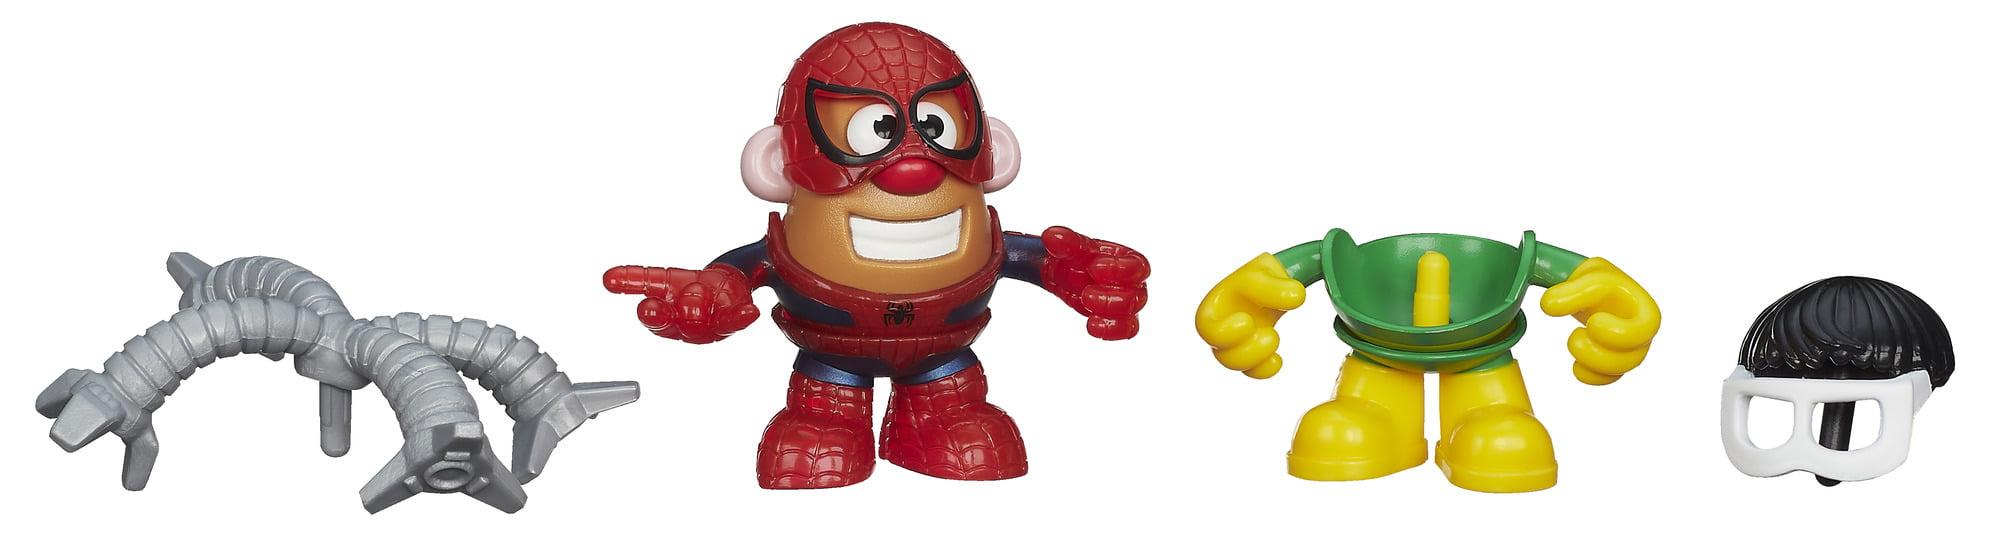 Playskool Mr. Potato Head Marvel Mixable Mashable Heroes as Spider-Man and Doc Ock by Hasbro, Inc